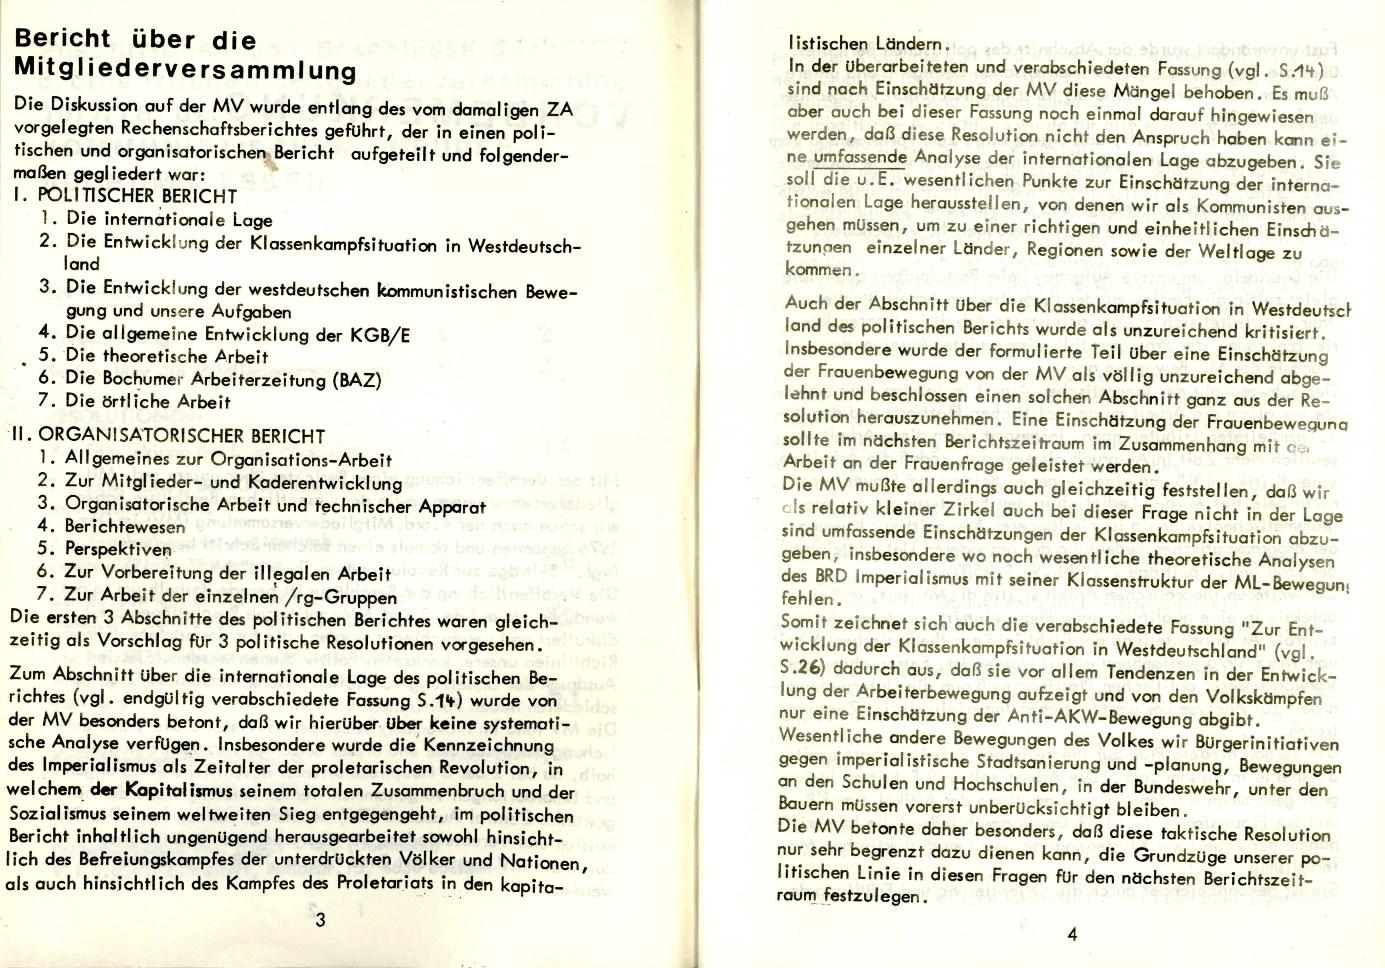 KGBE_1978_Resolutionen_03